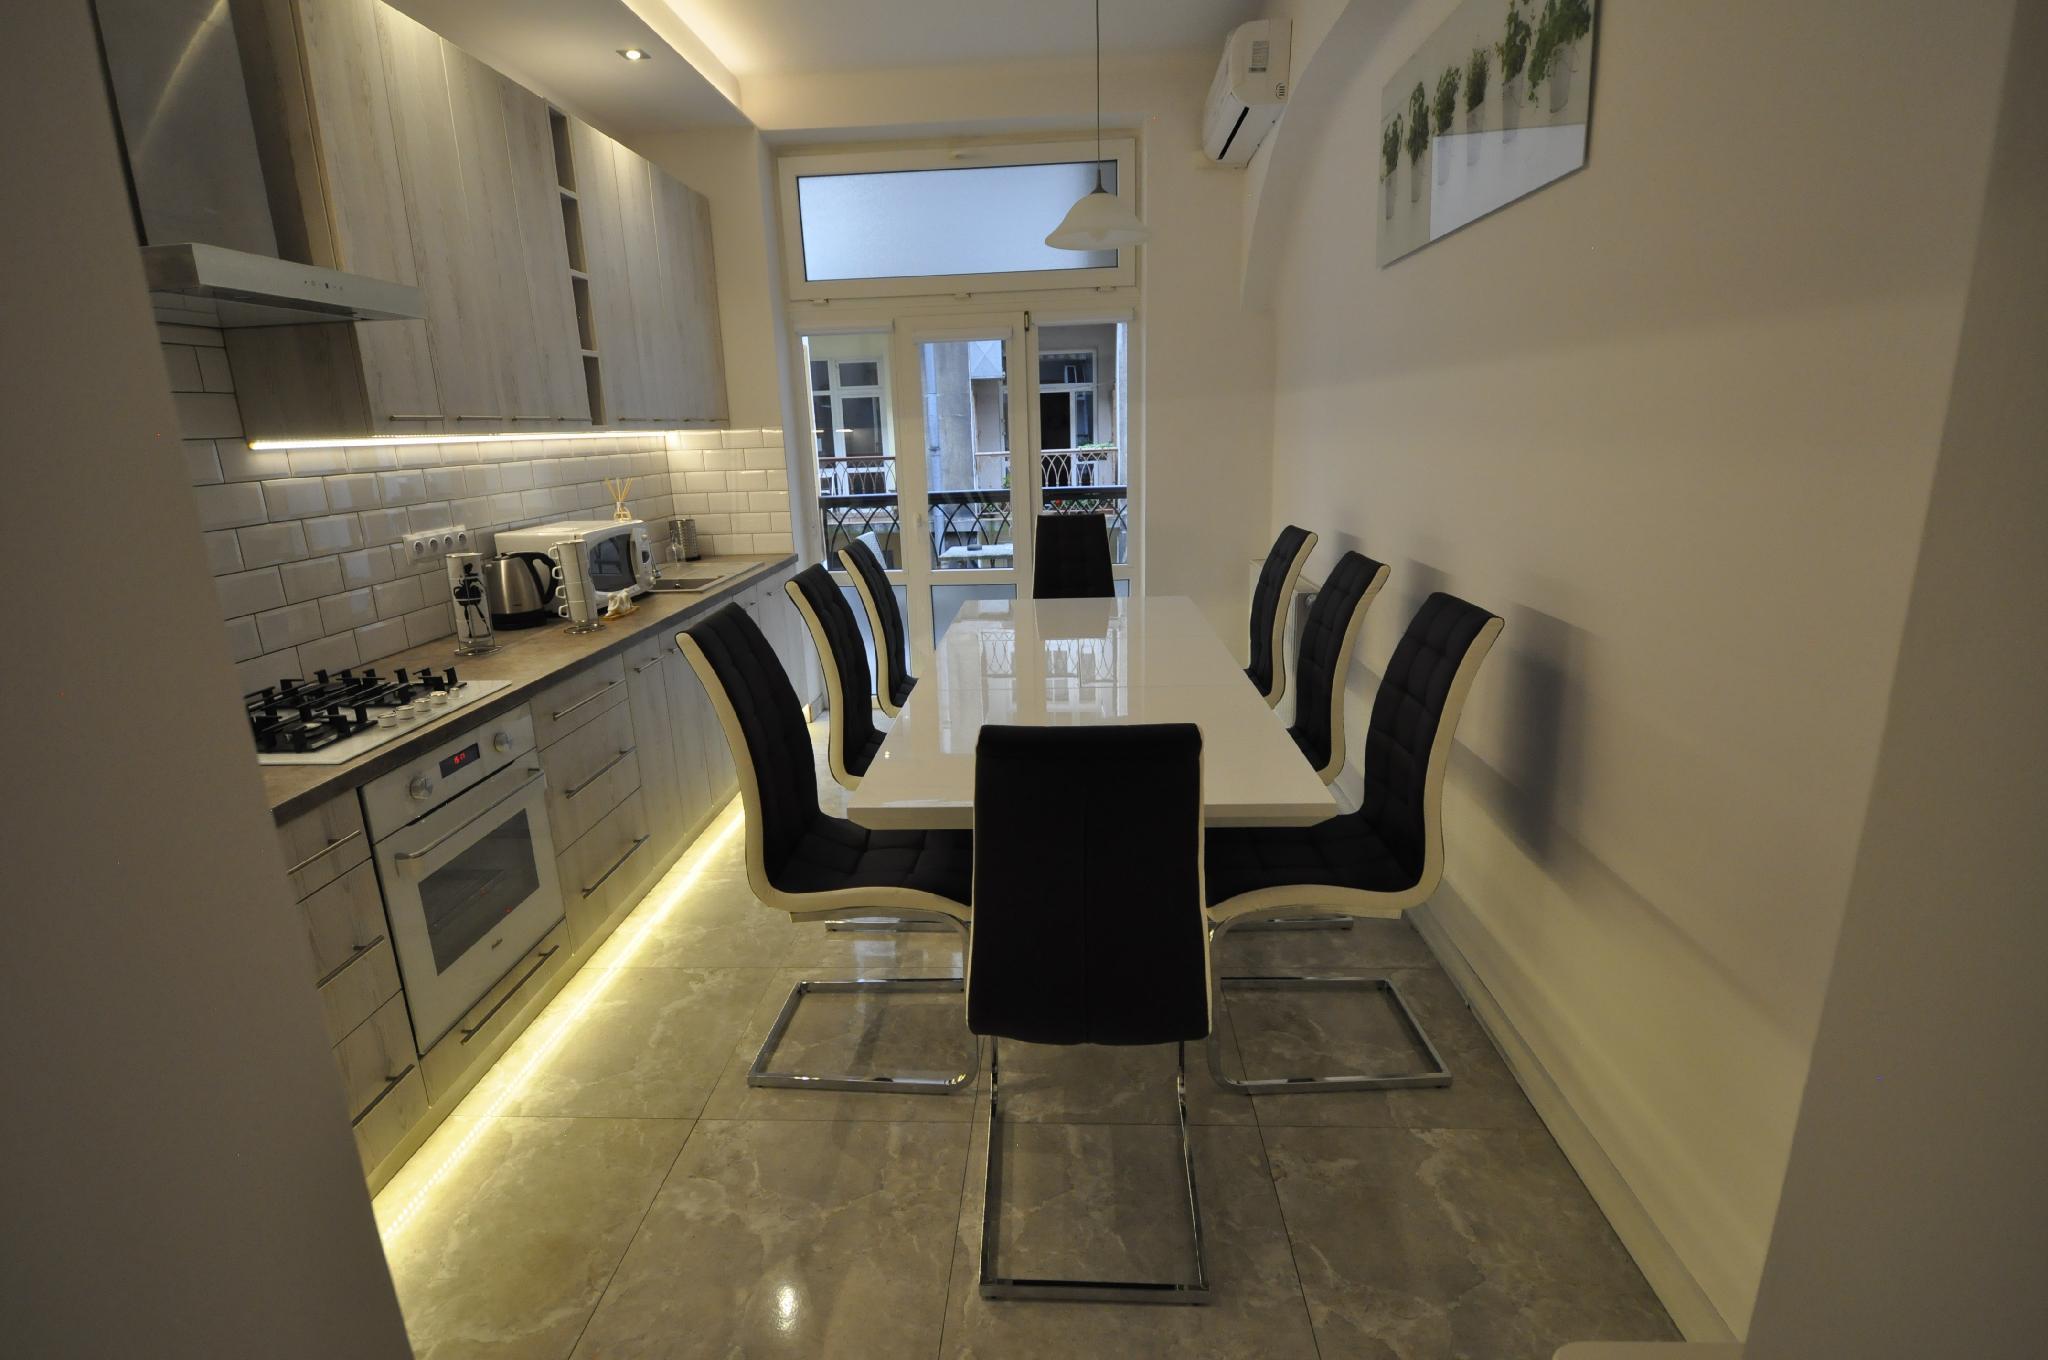 Luxury Apartment With ParkingandAirconditionandSauna